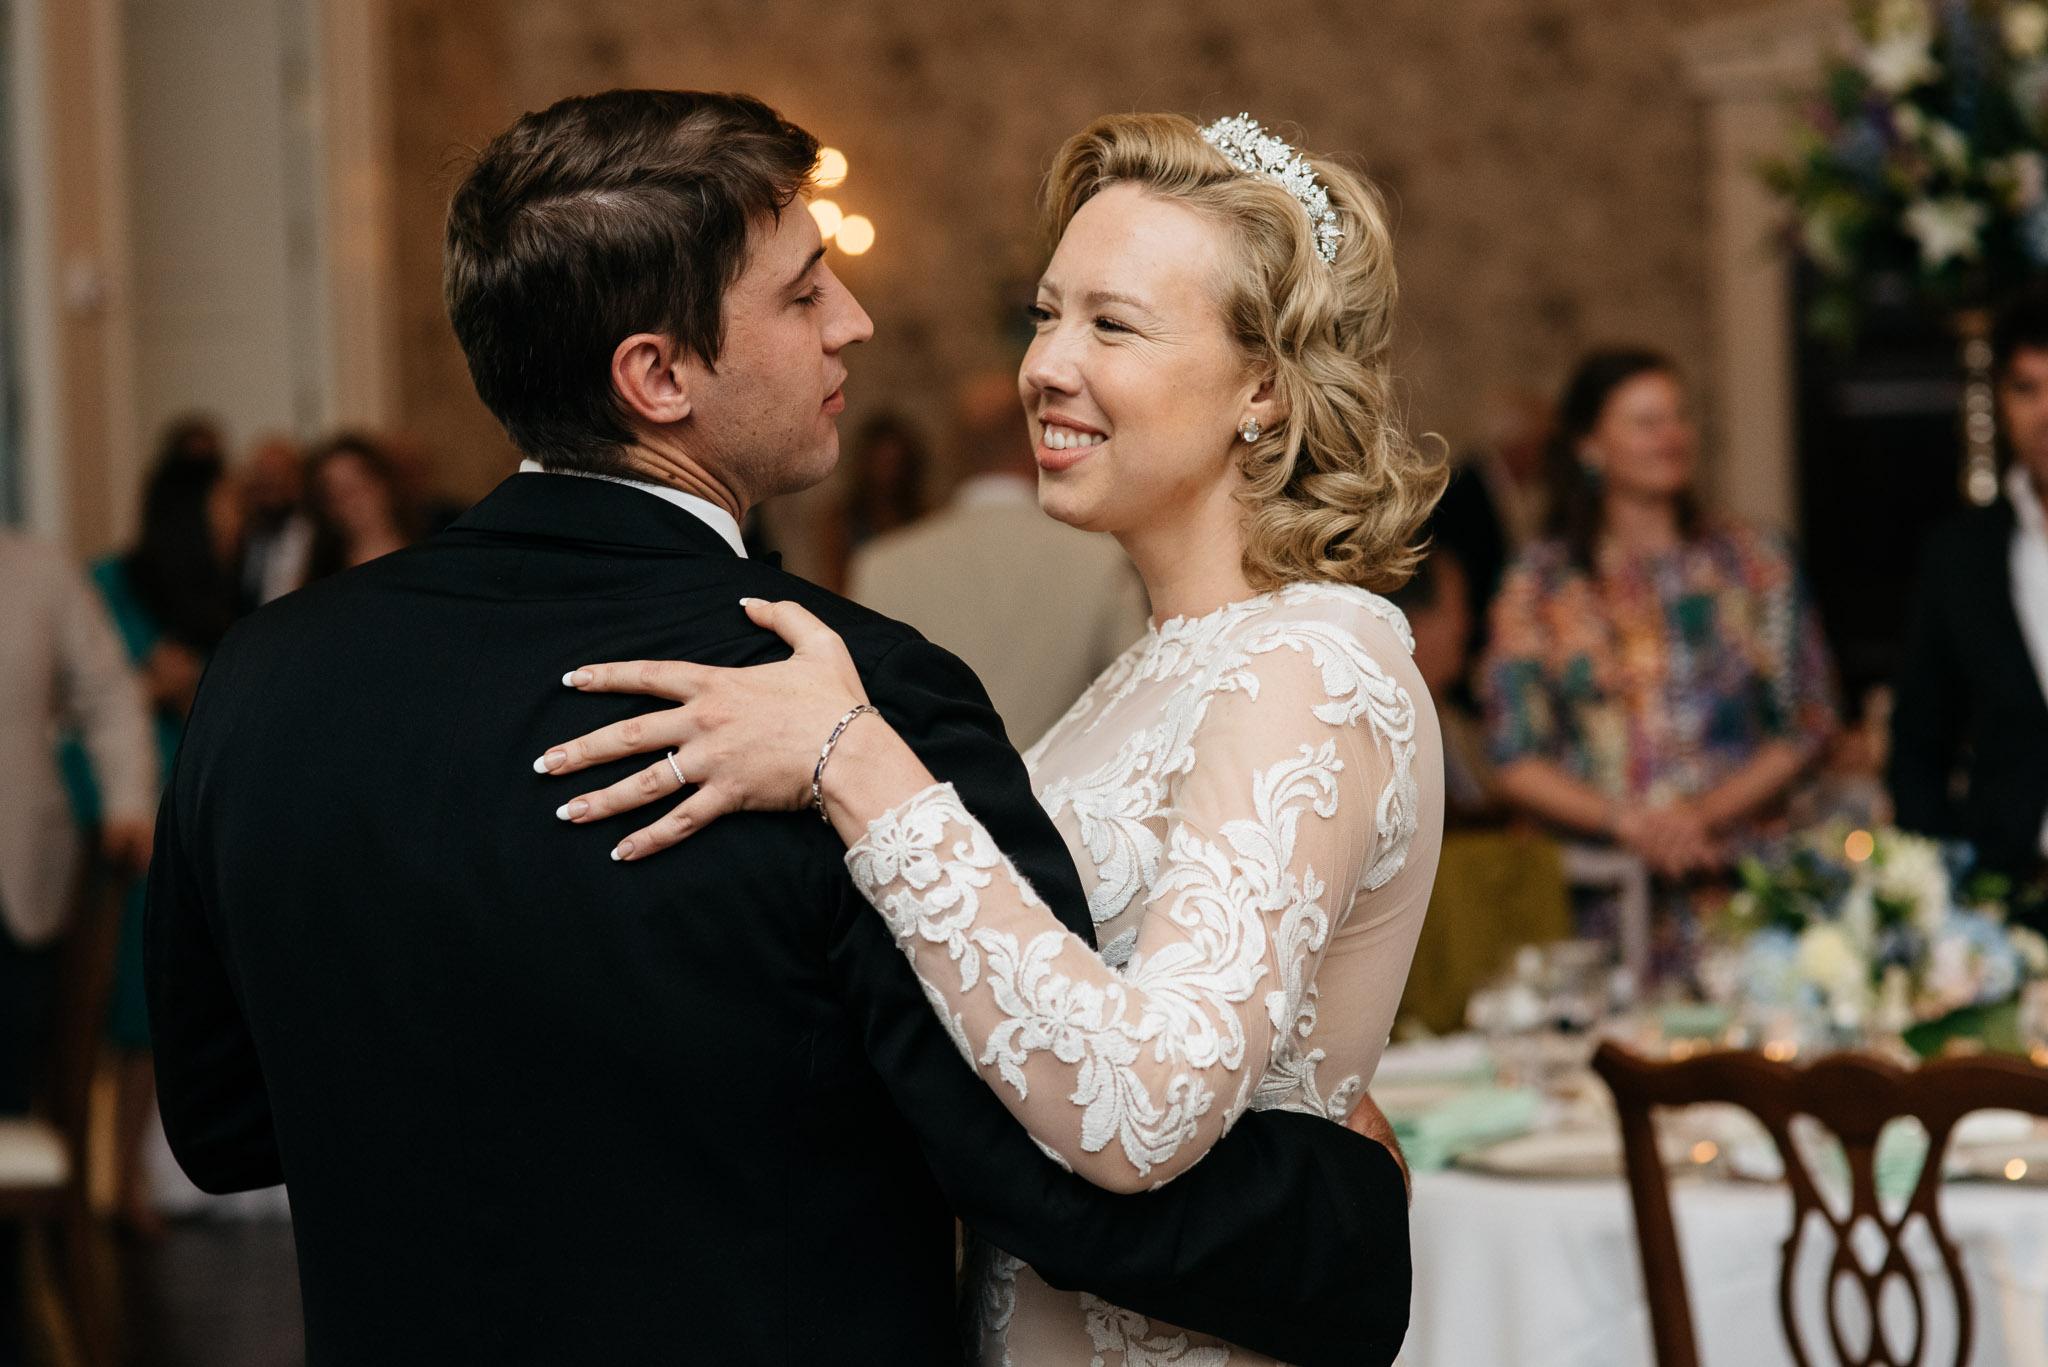 Ligonier & Pittsburgh wedding photographer mariah fisher-13.jpg